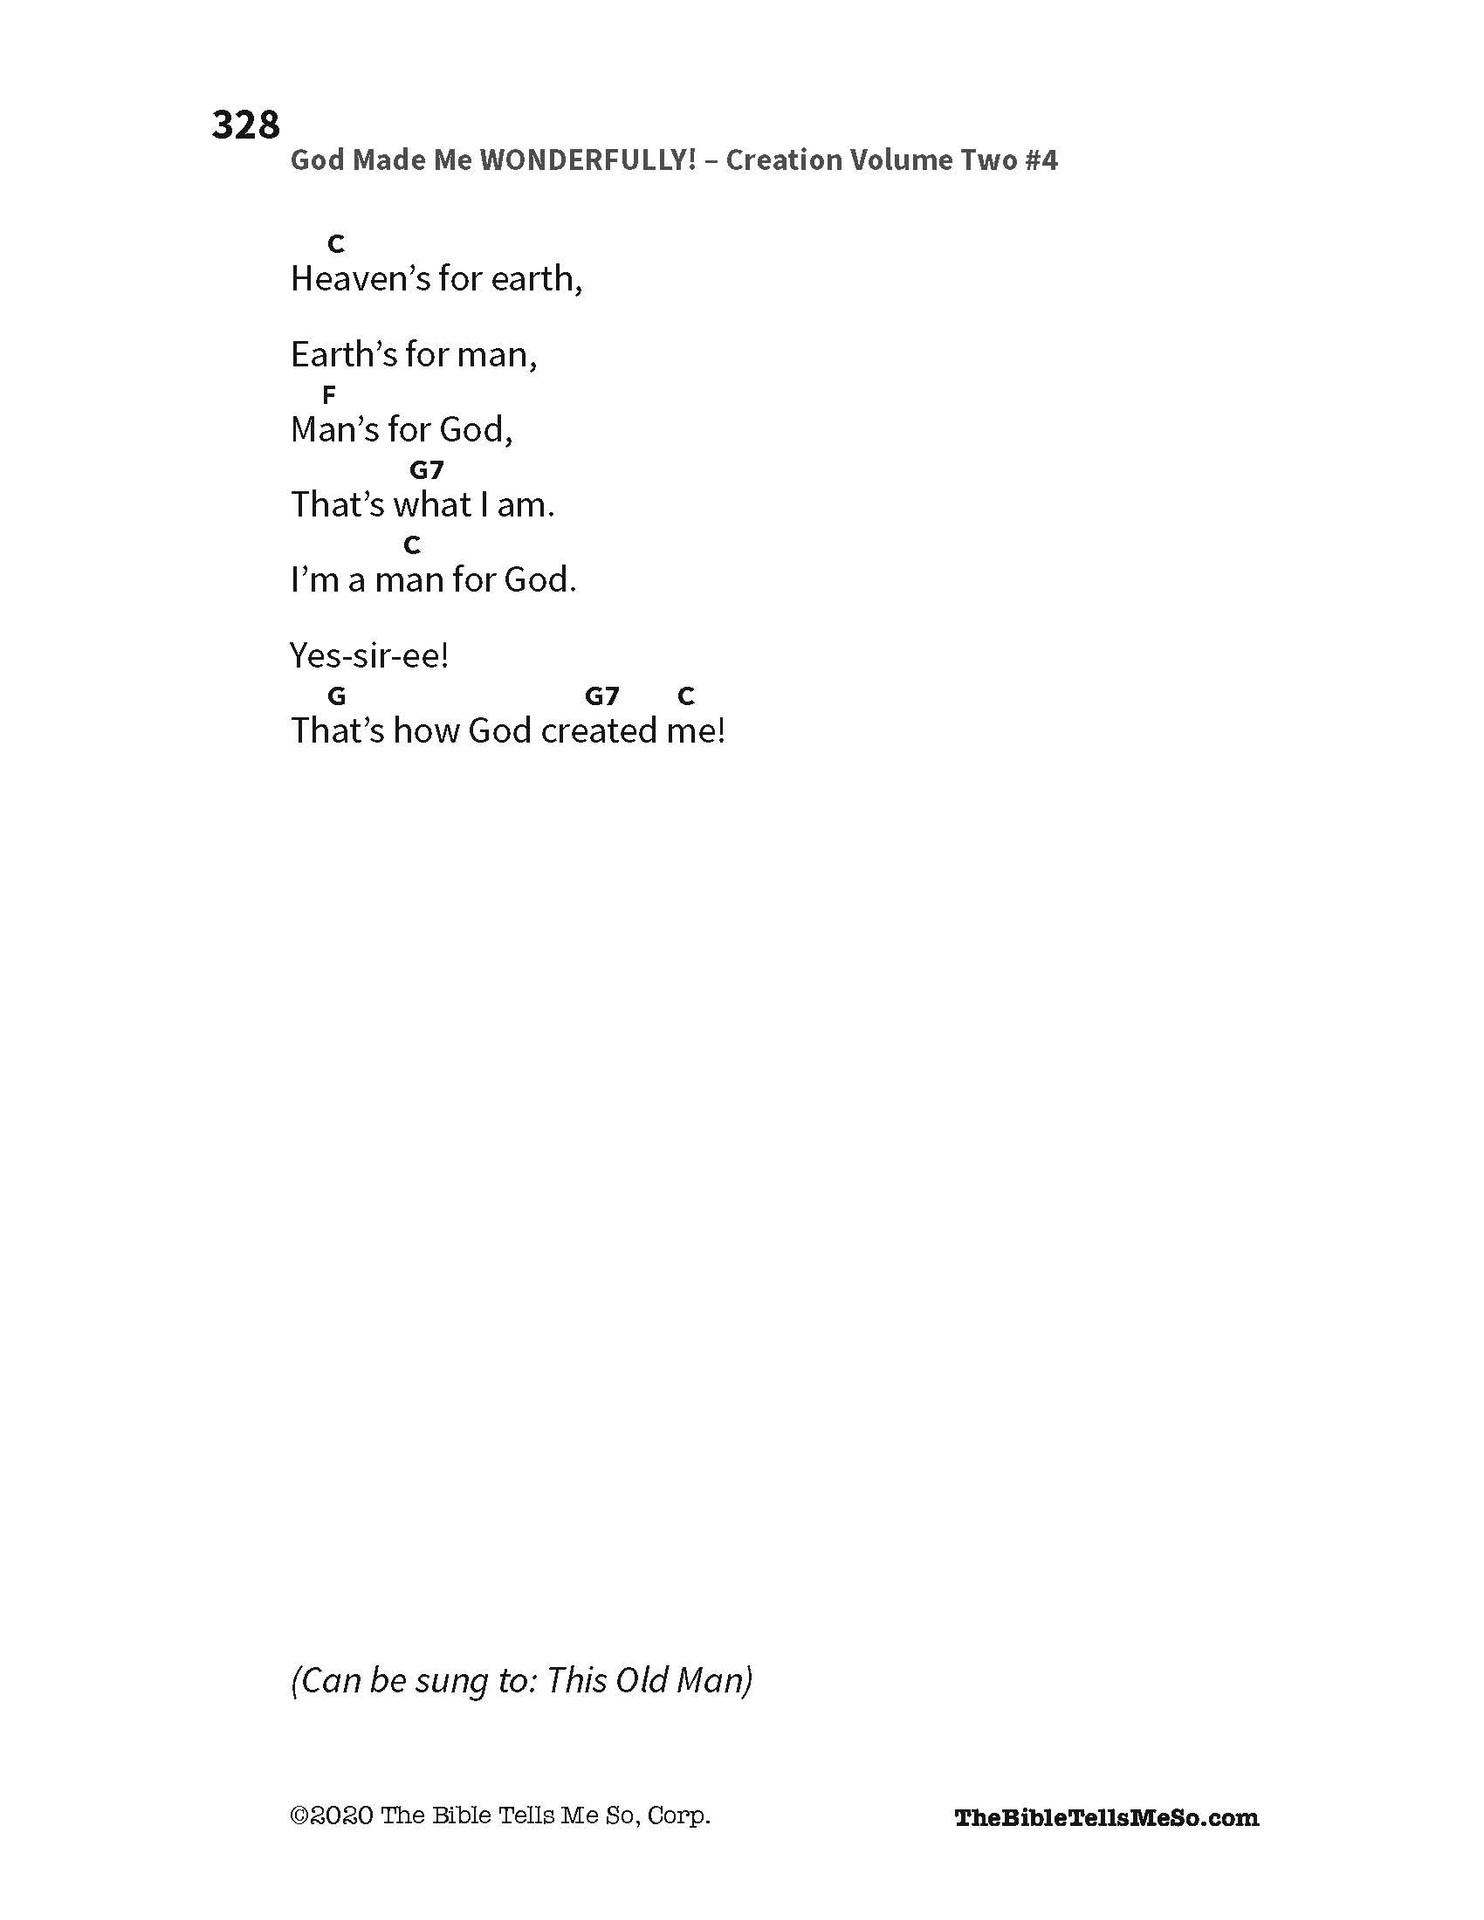 SongSheets-JPGS_Page_330.jpg